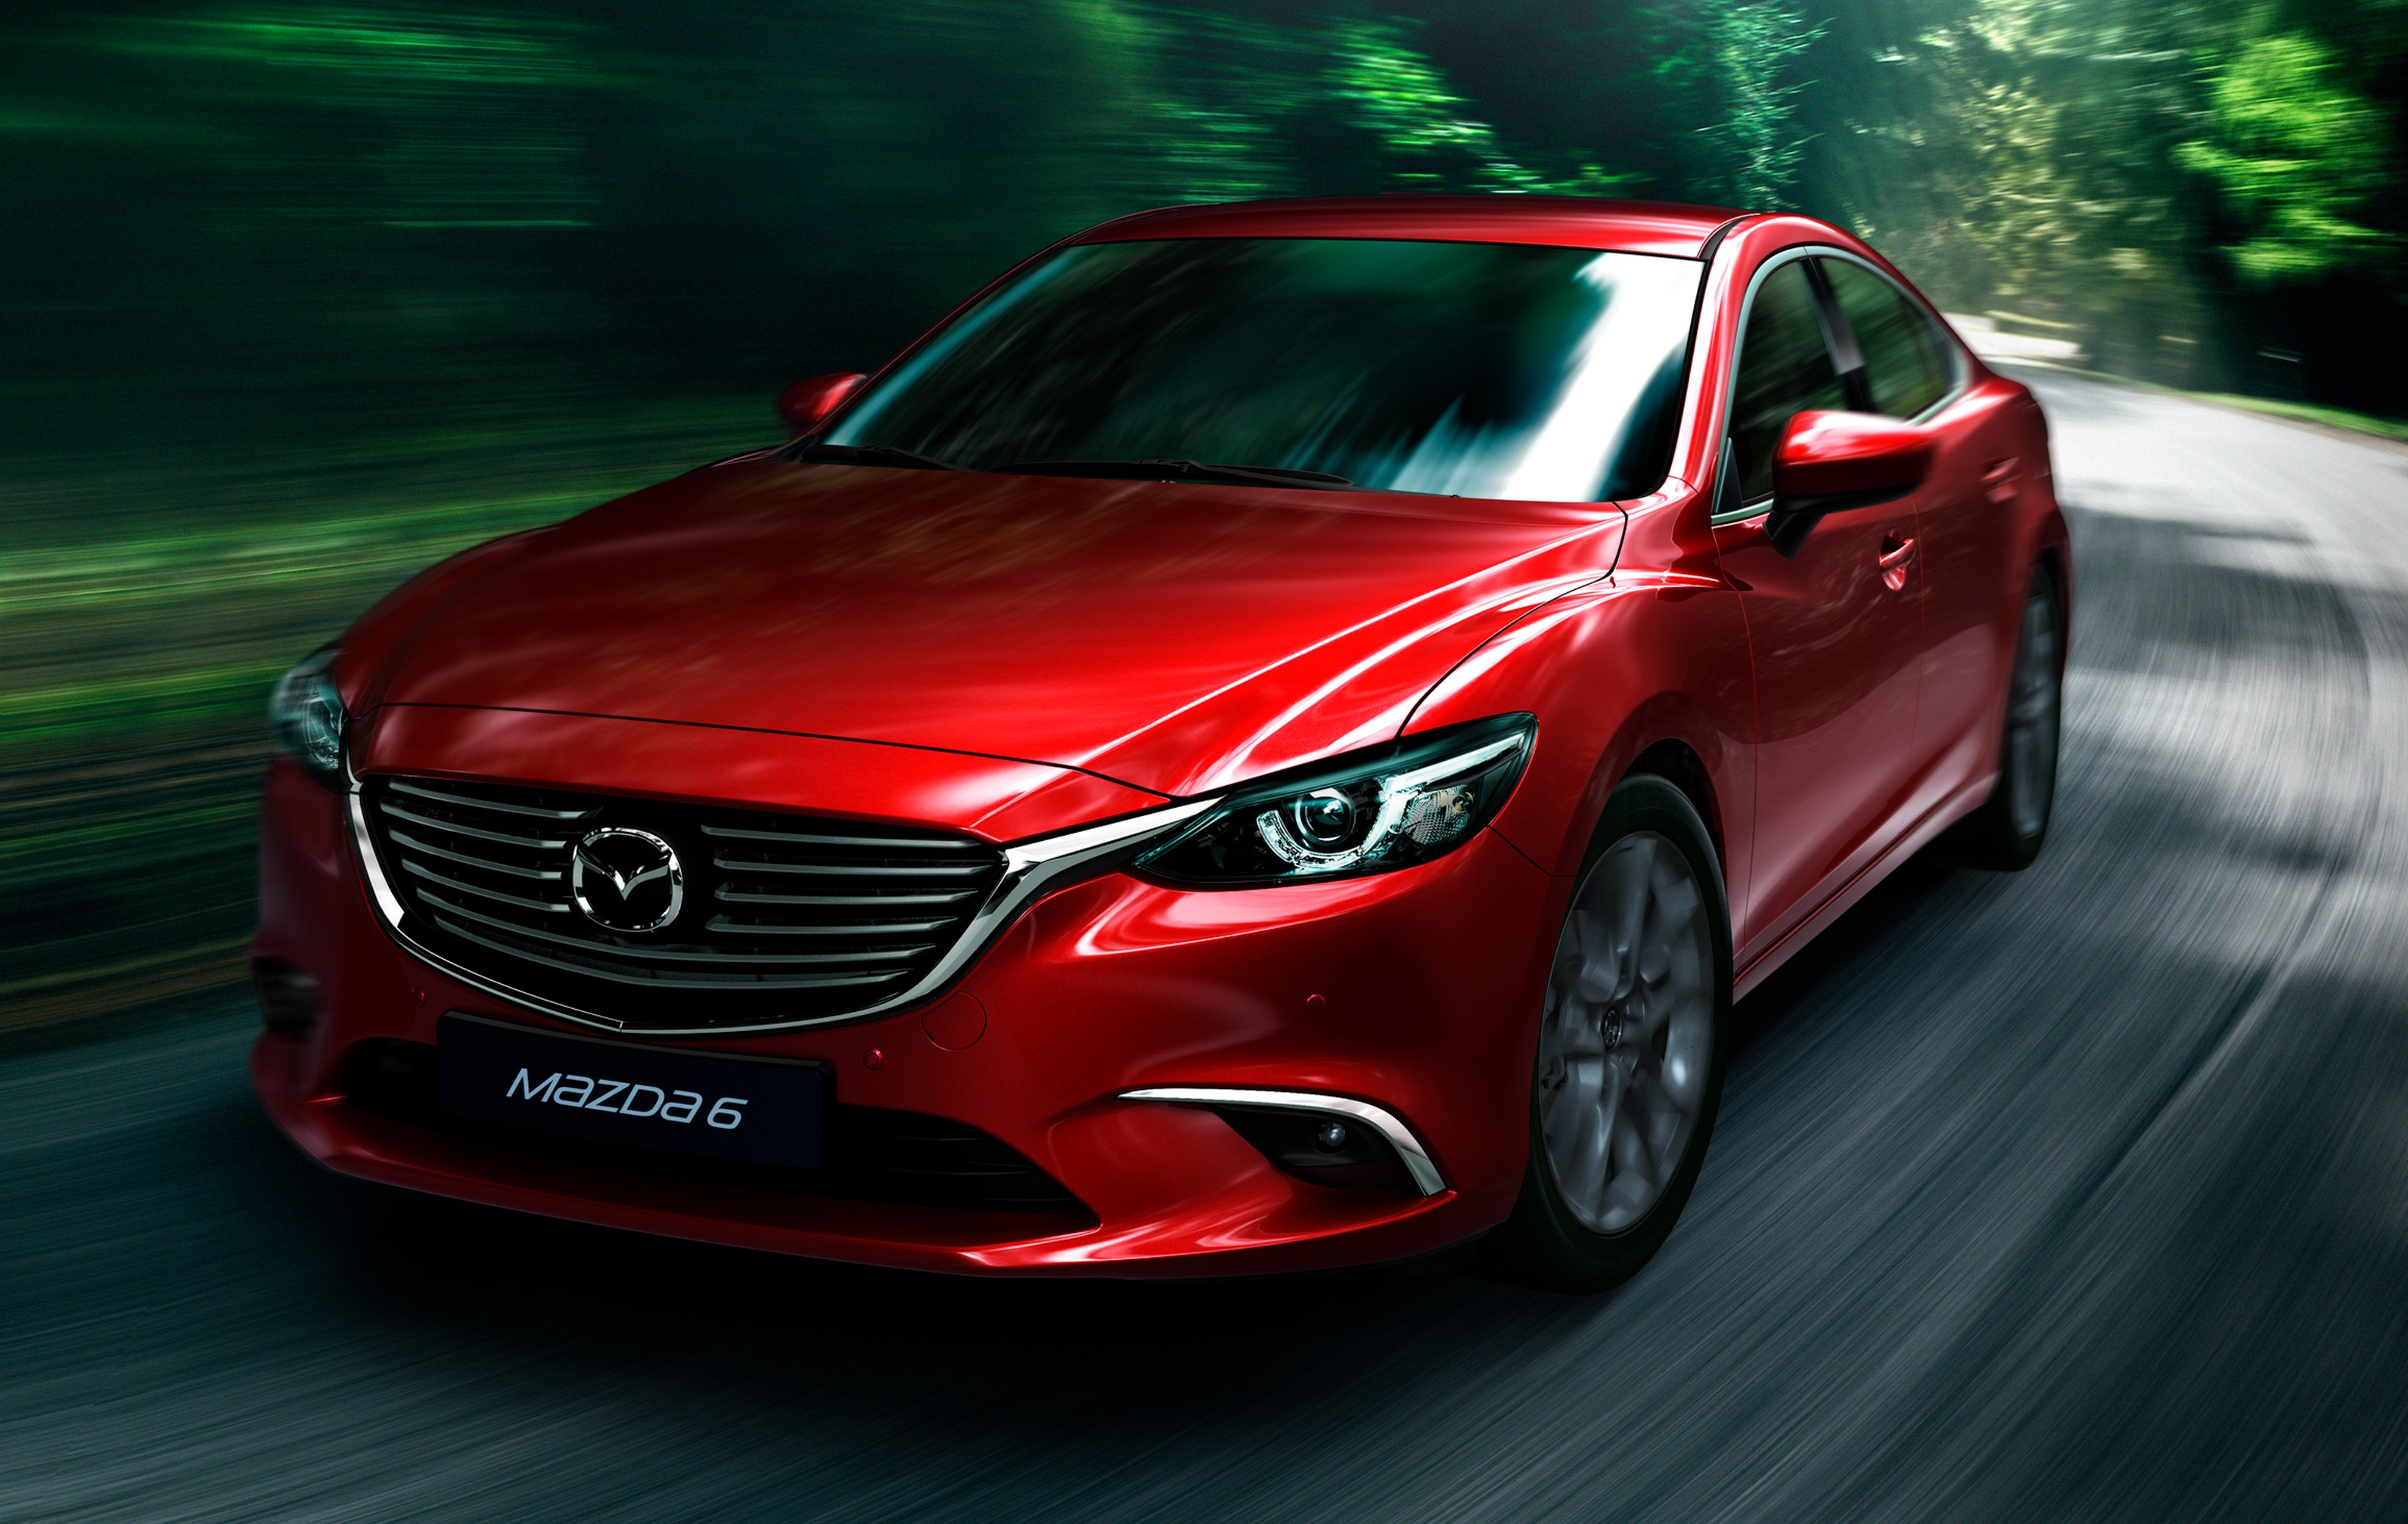 Подбор и замена салонного фильтра Mazda 6 GJ с 2012 г.в.